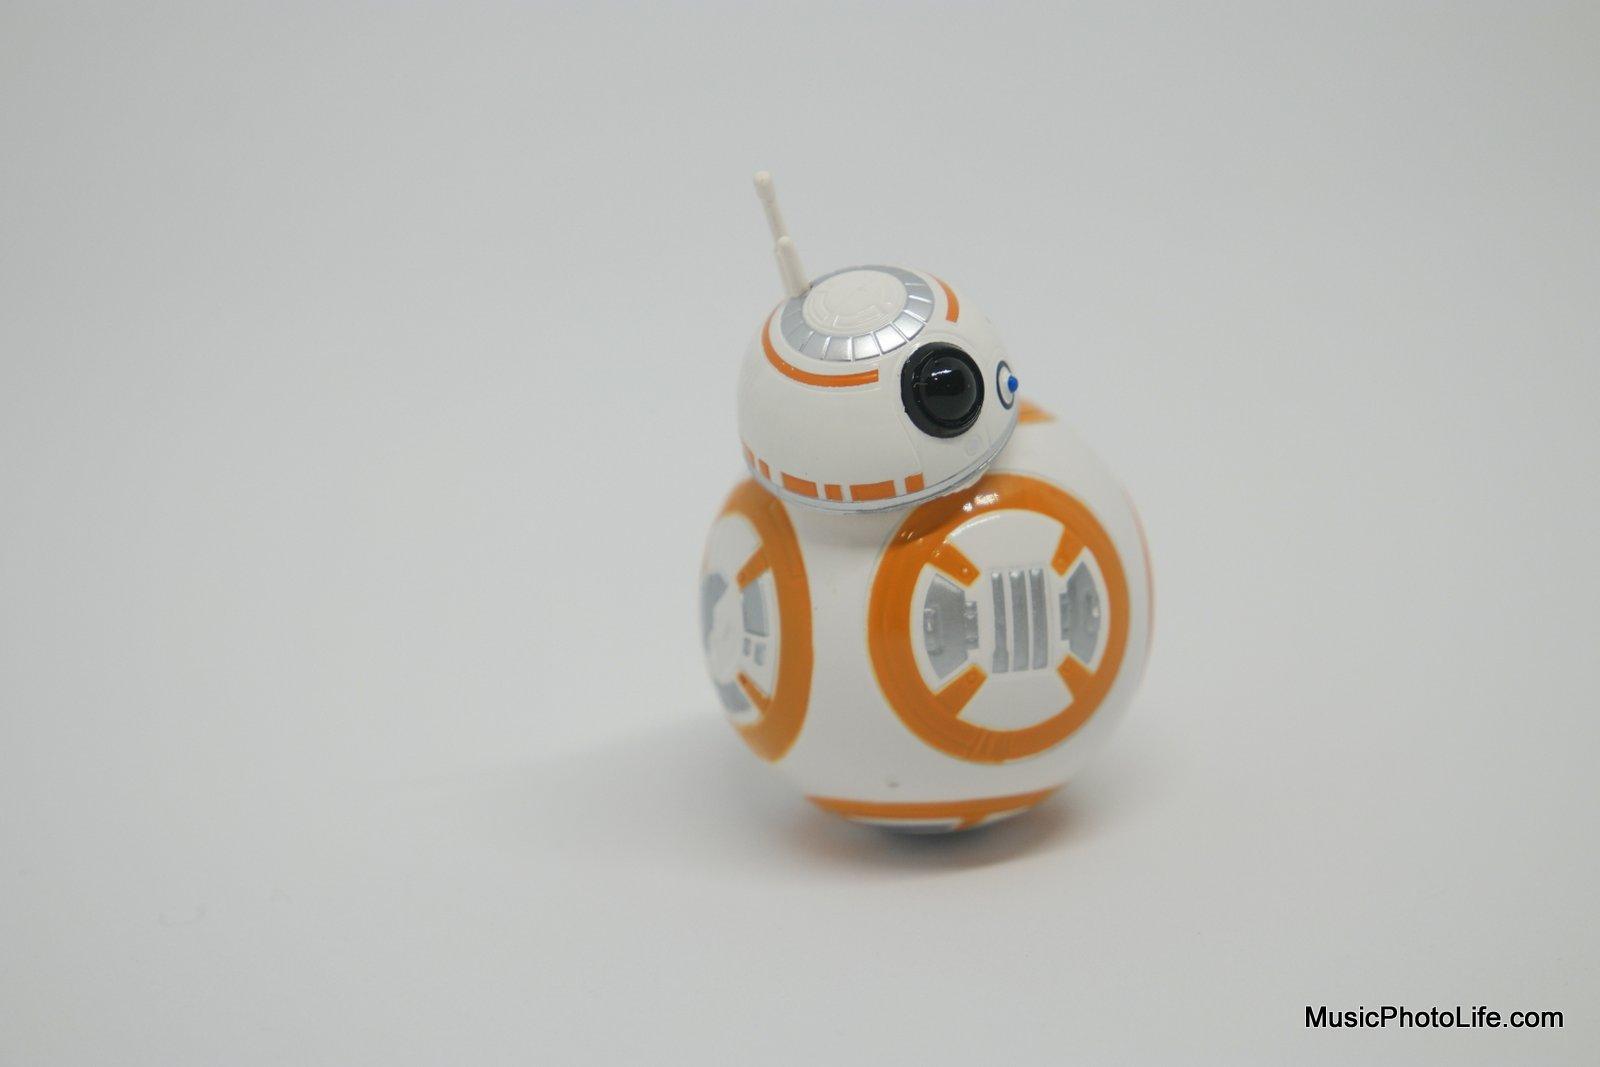 Star Wars BB-8 shot on Whitebox Lightbox review by musicphotolife.com